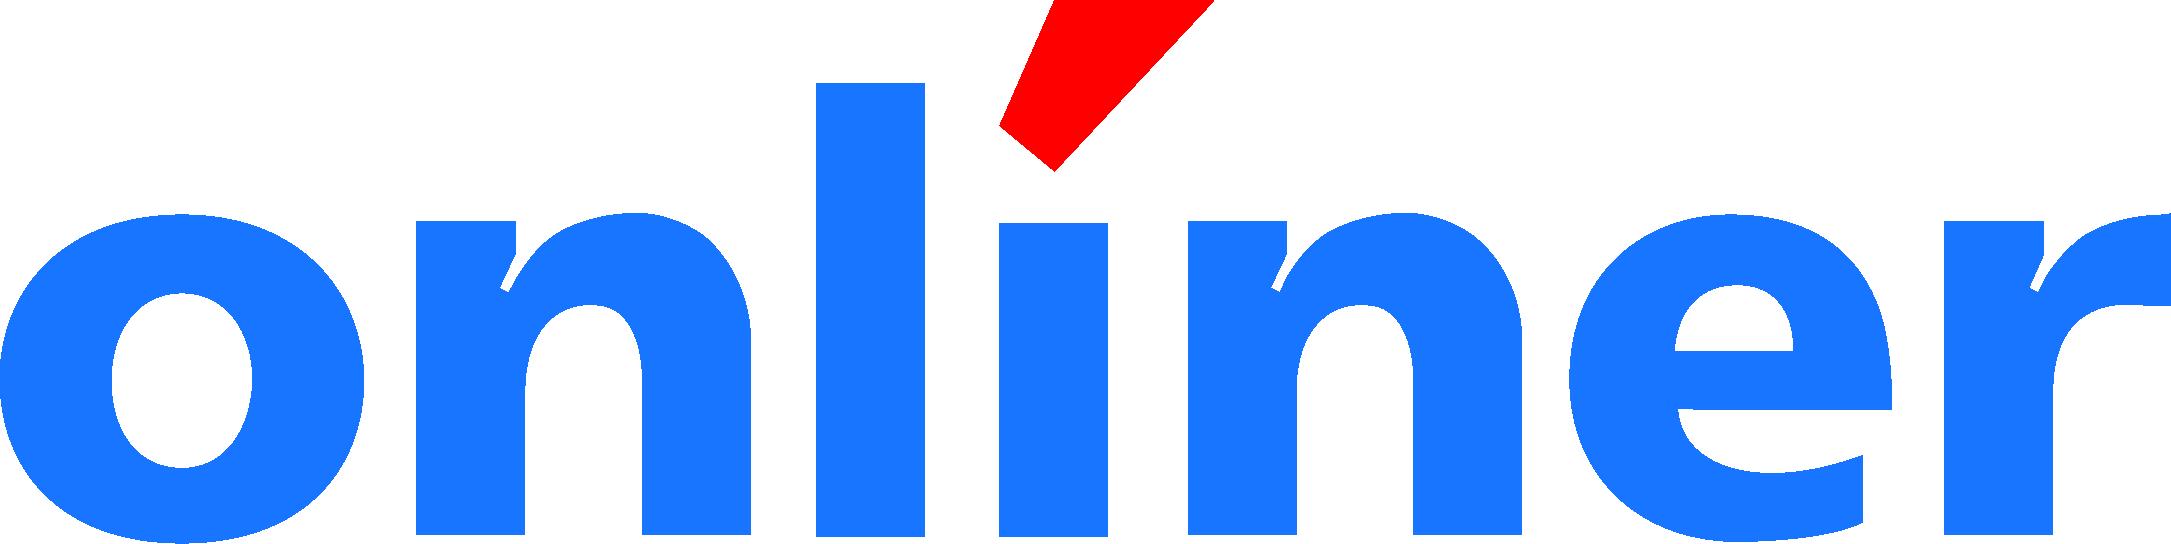 onliner logo